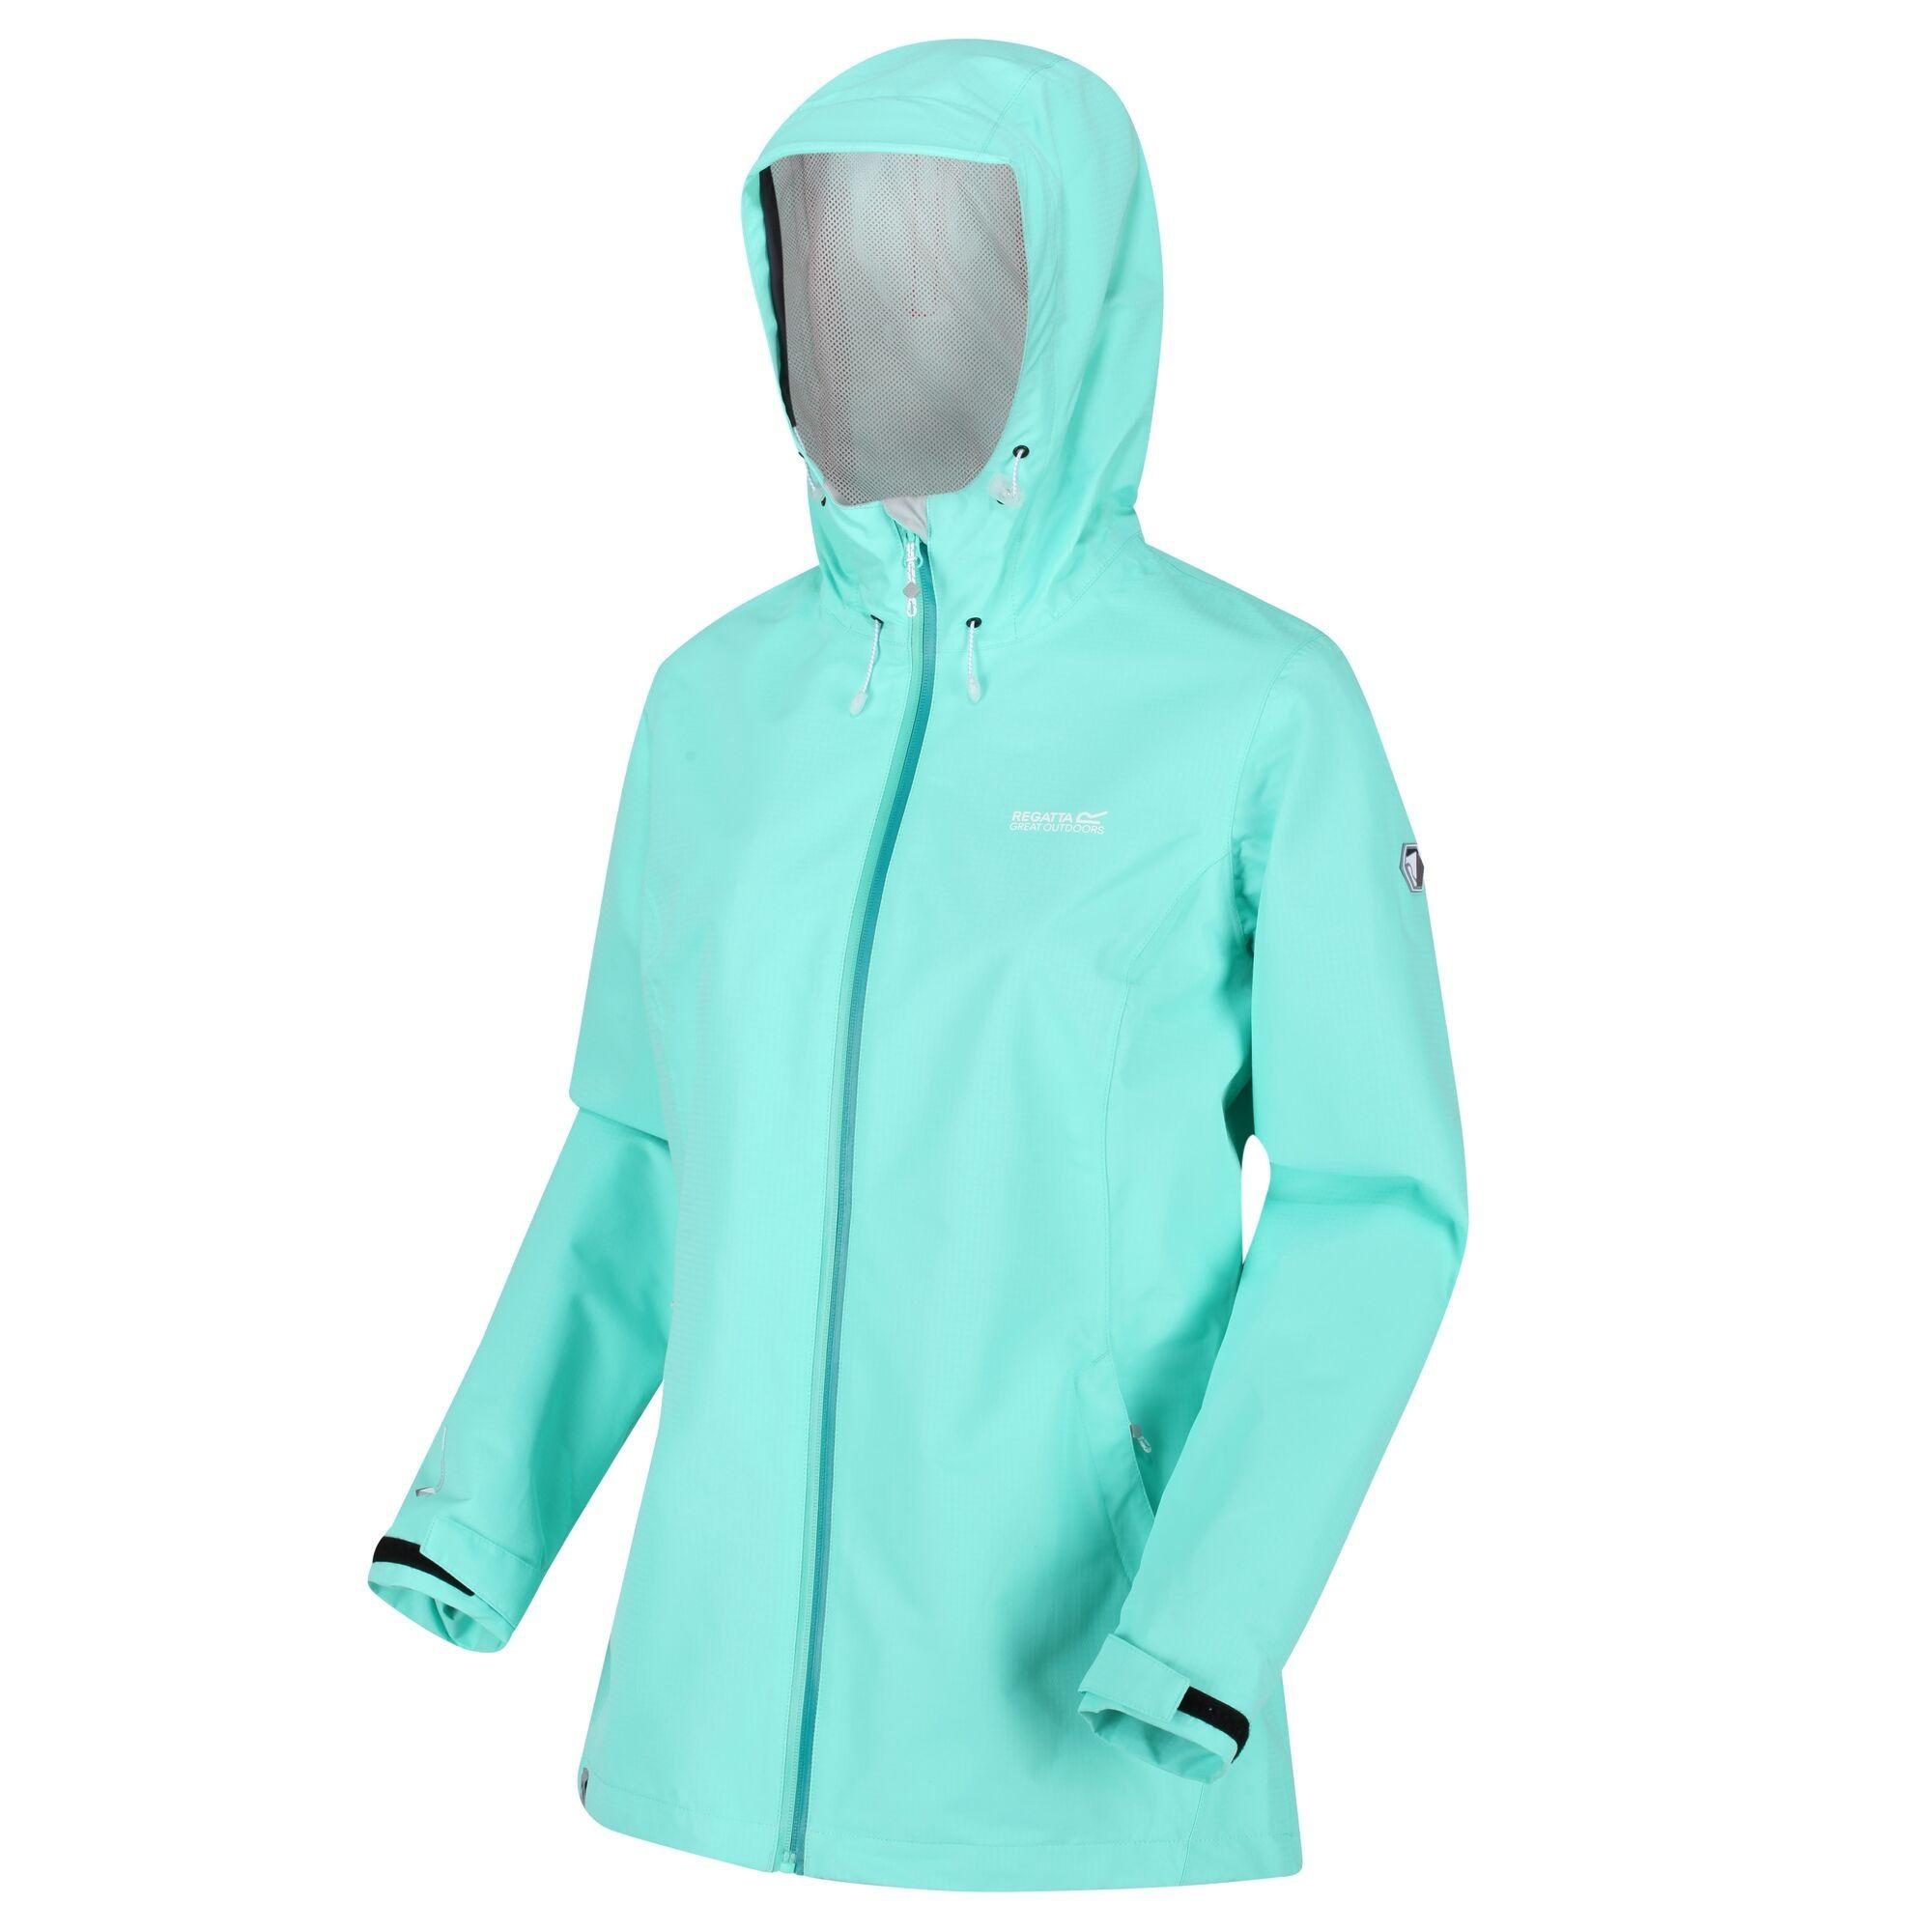 Regatta Women's Hamara III Waterproof Jacket